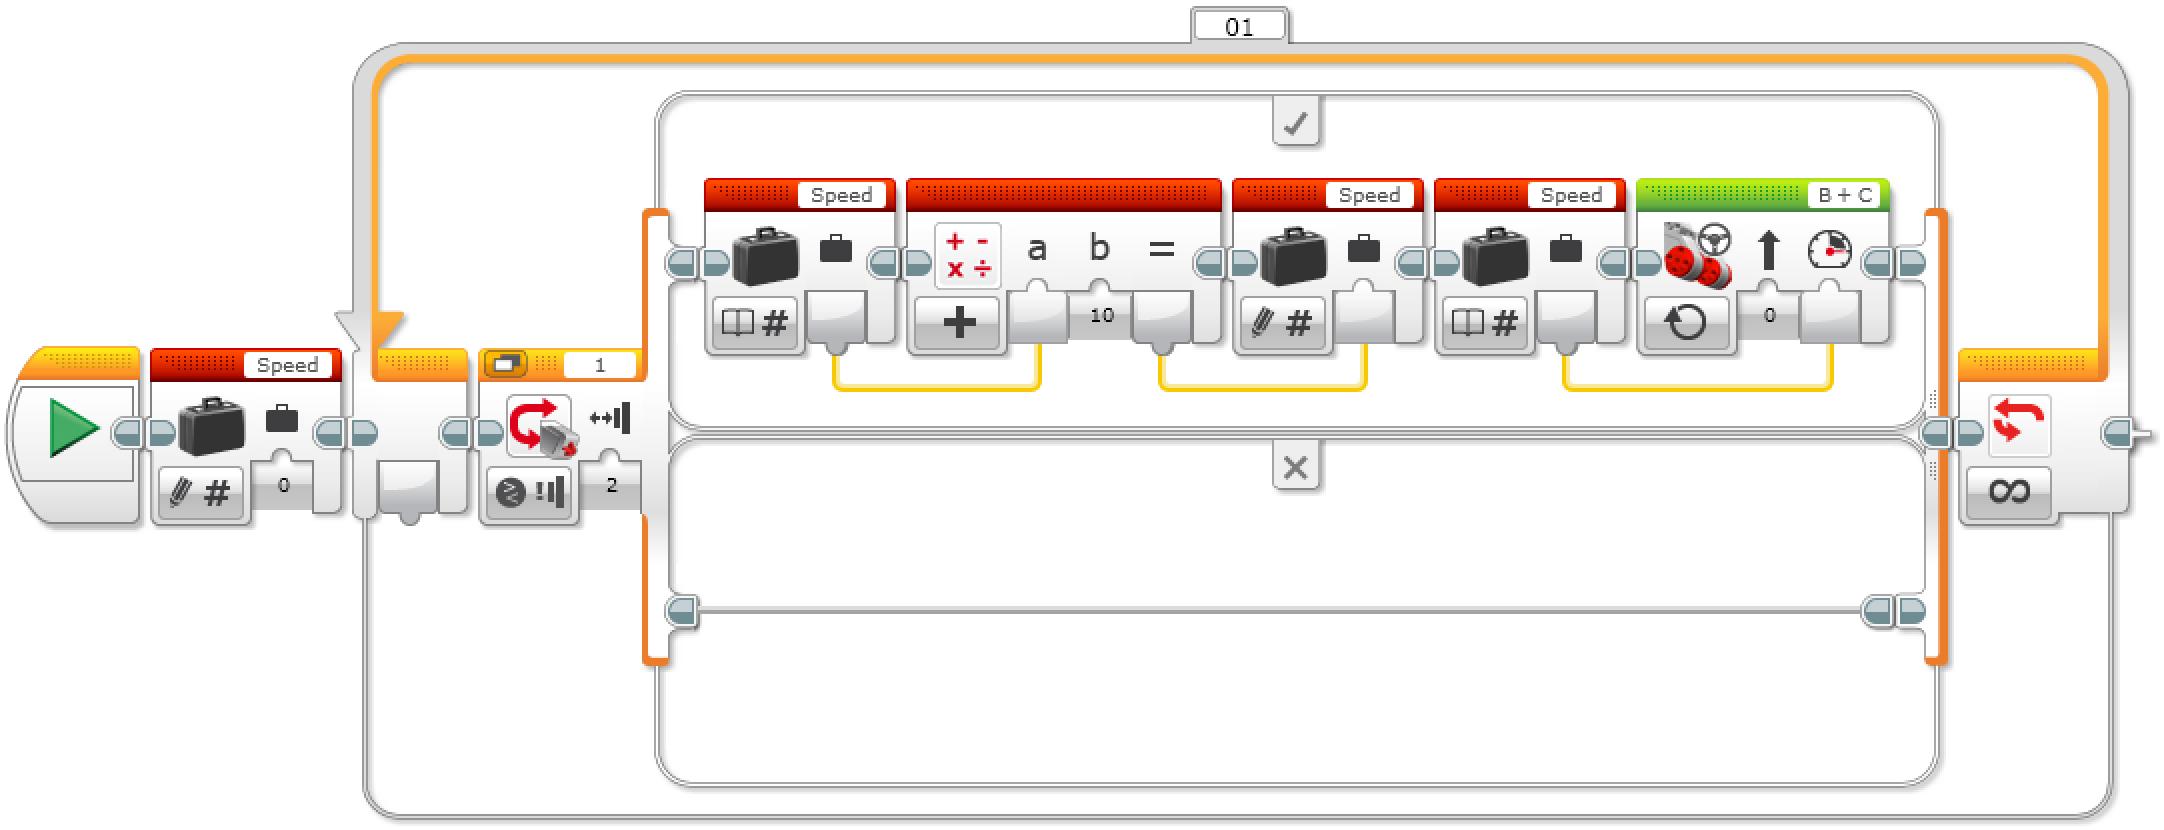 Cruise Control - EV3 Coding Activities - Lesson Plans - LEGO Education